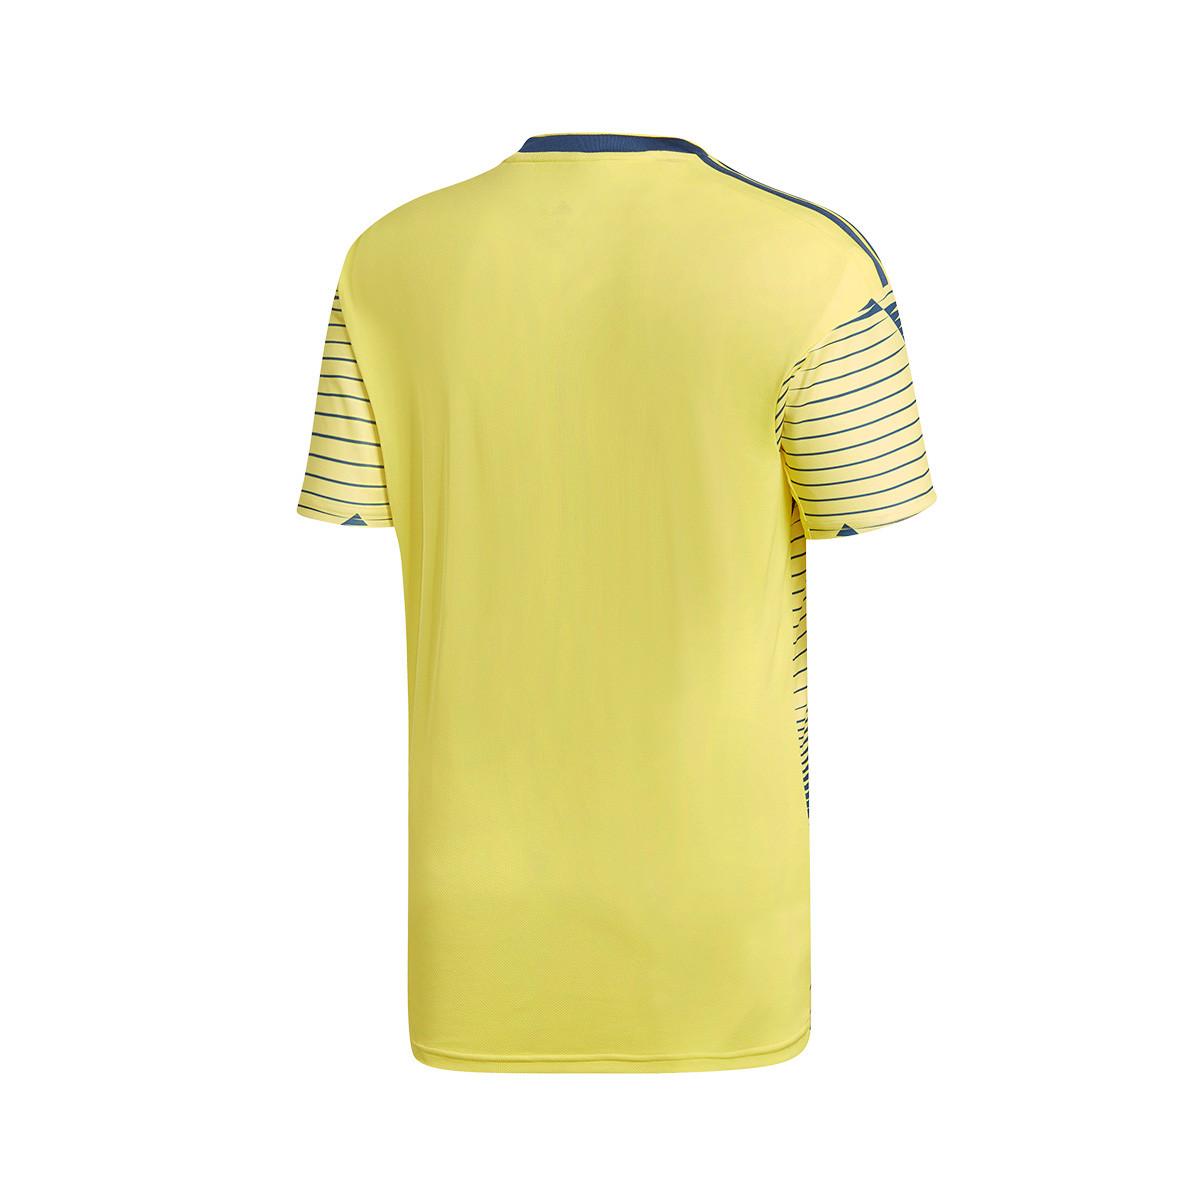 f3b0f4d8d8e80 Jersey adidas Colombia 2019 Home Light yellow-Night marine - Football store  Fútbol Emotion